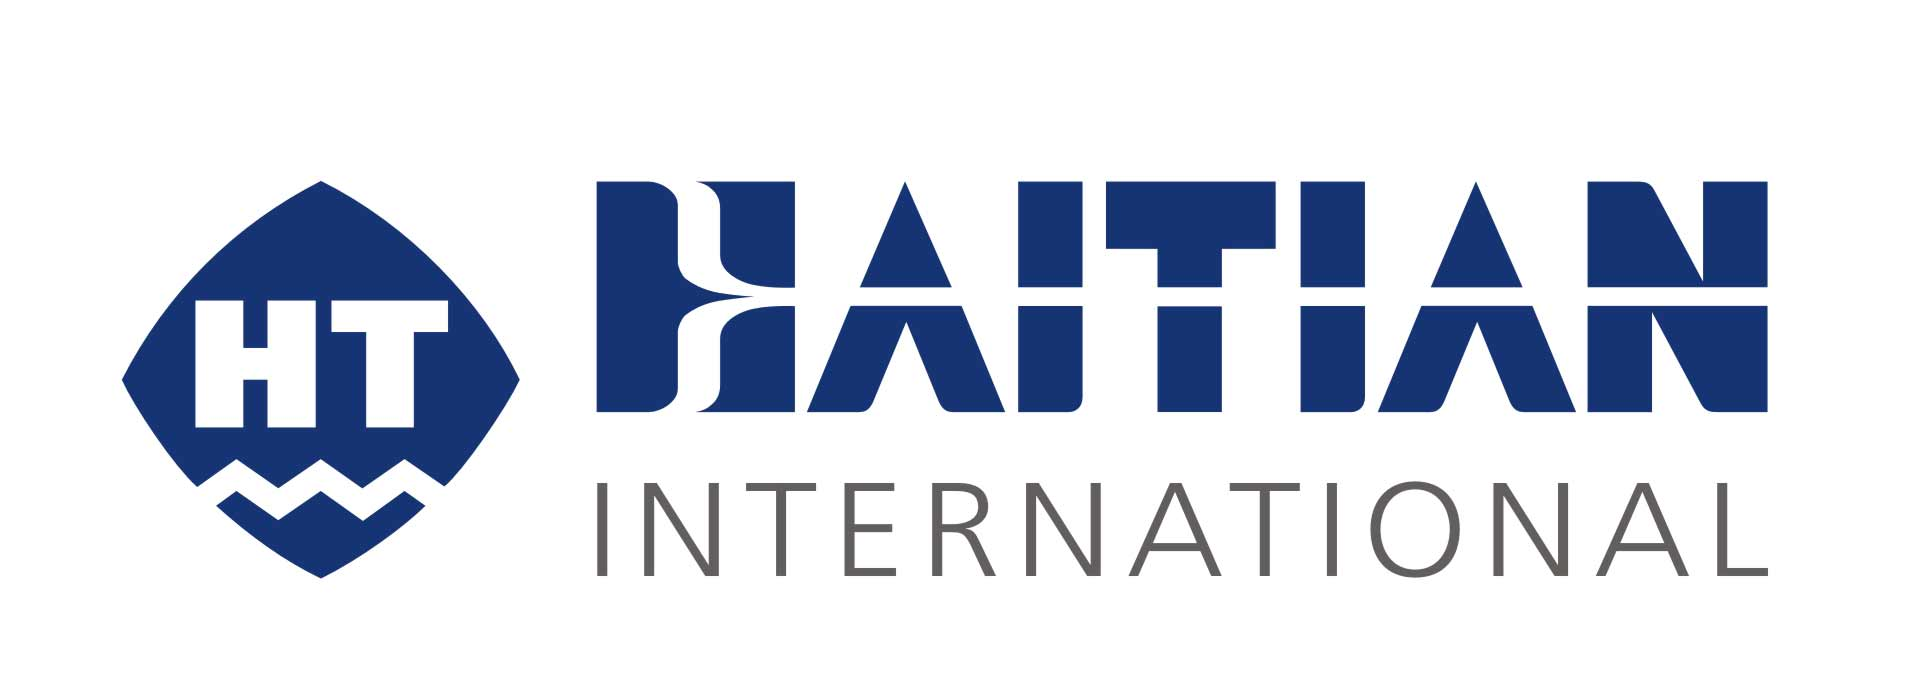 HAITIAN MACHINERY TEAL İKLİMLENDİRMEYİ TERCİH ETTİ